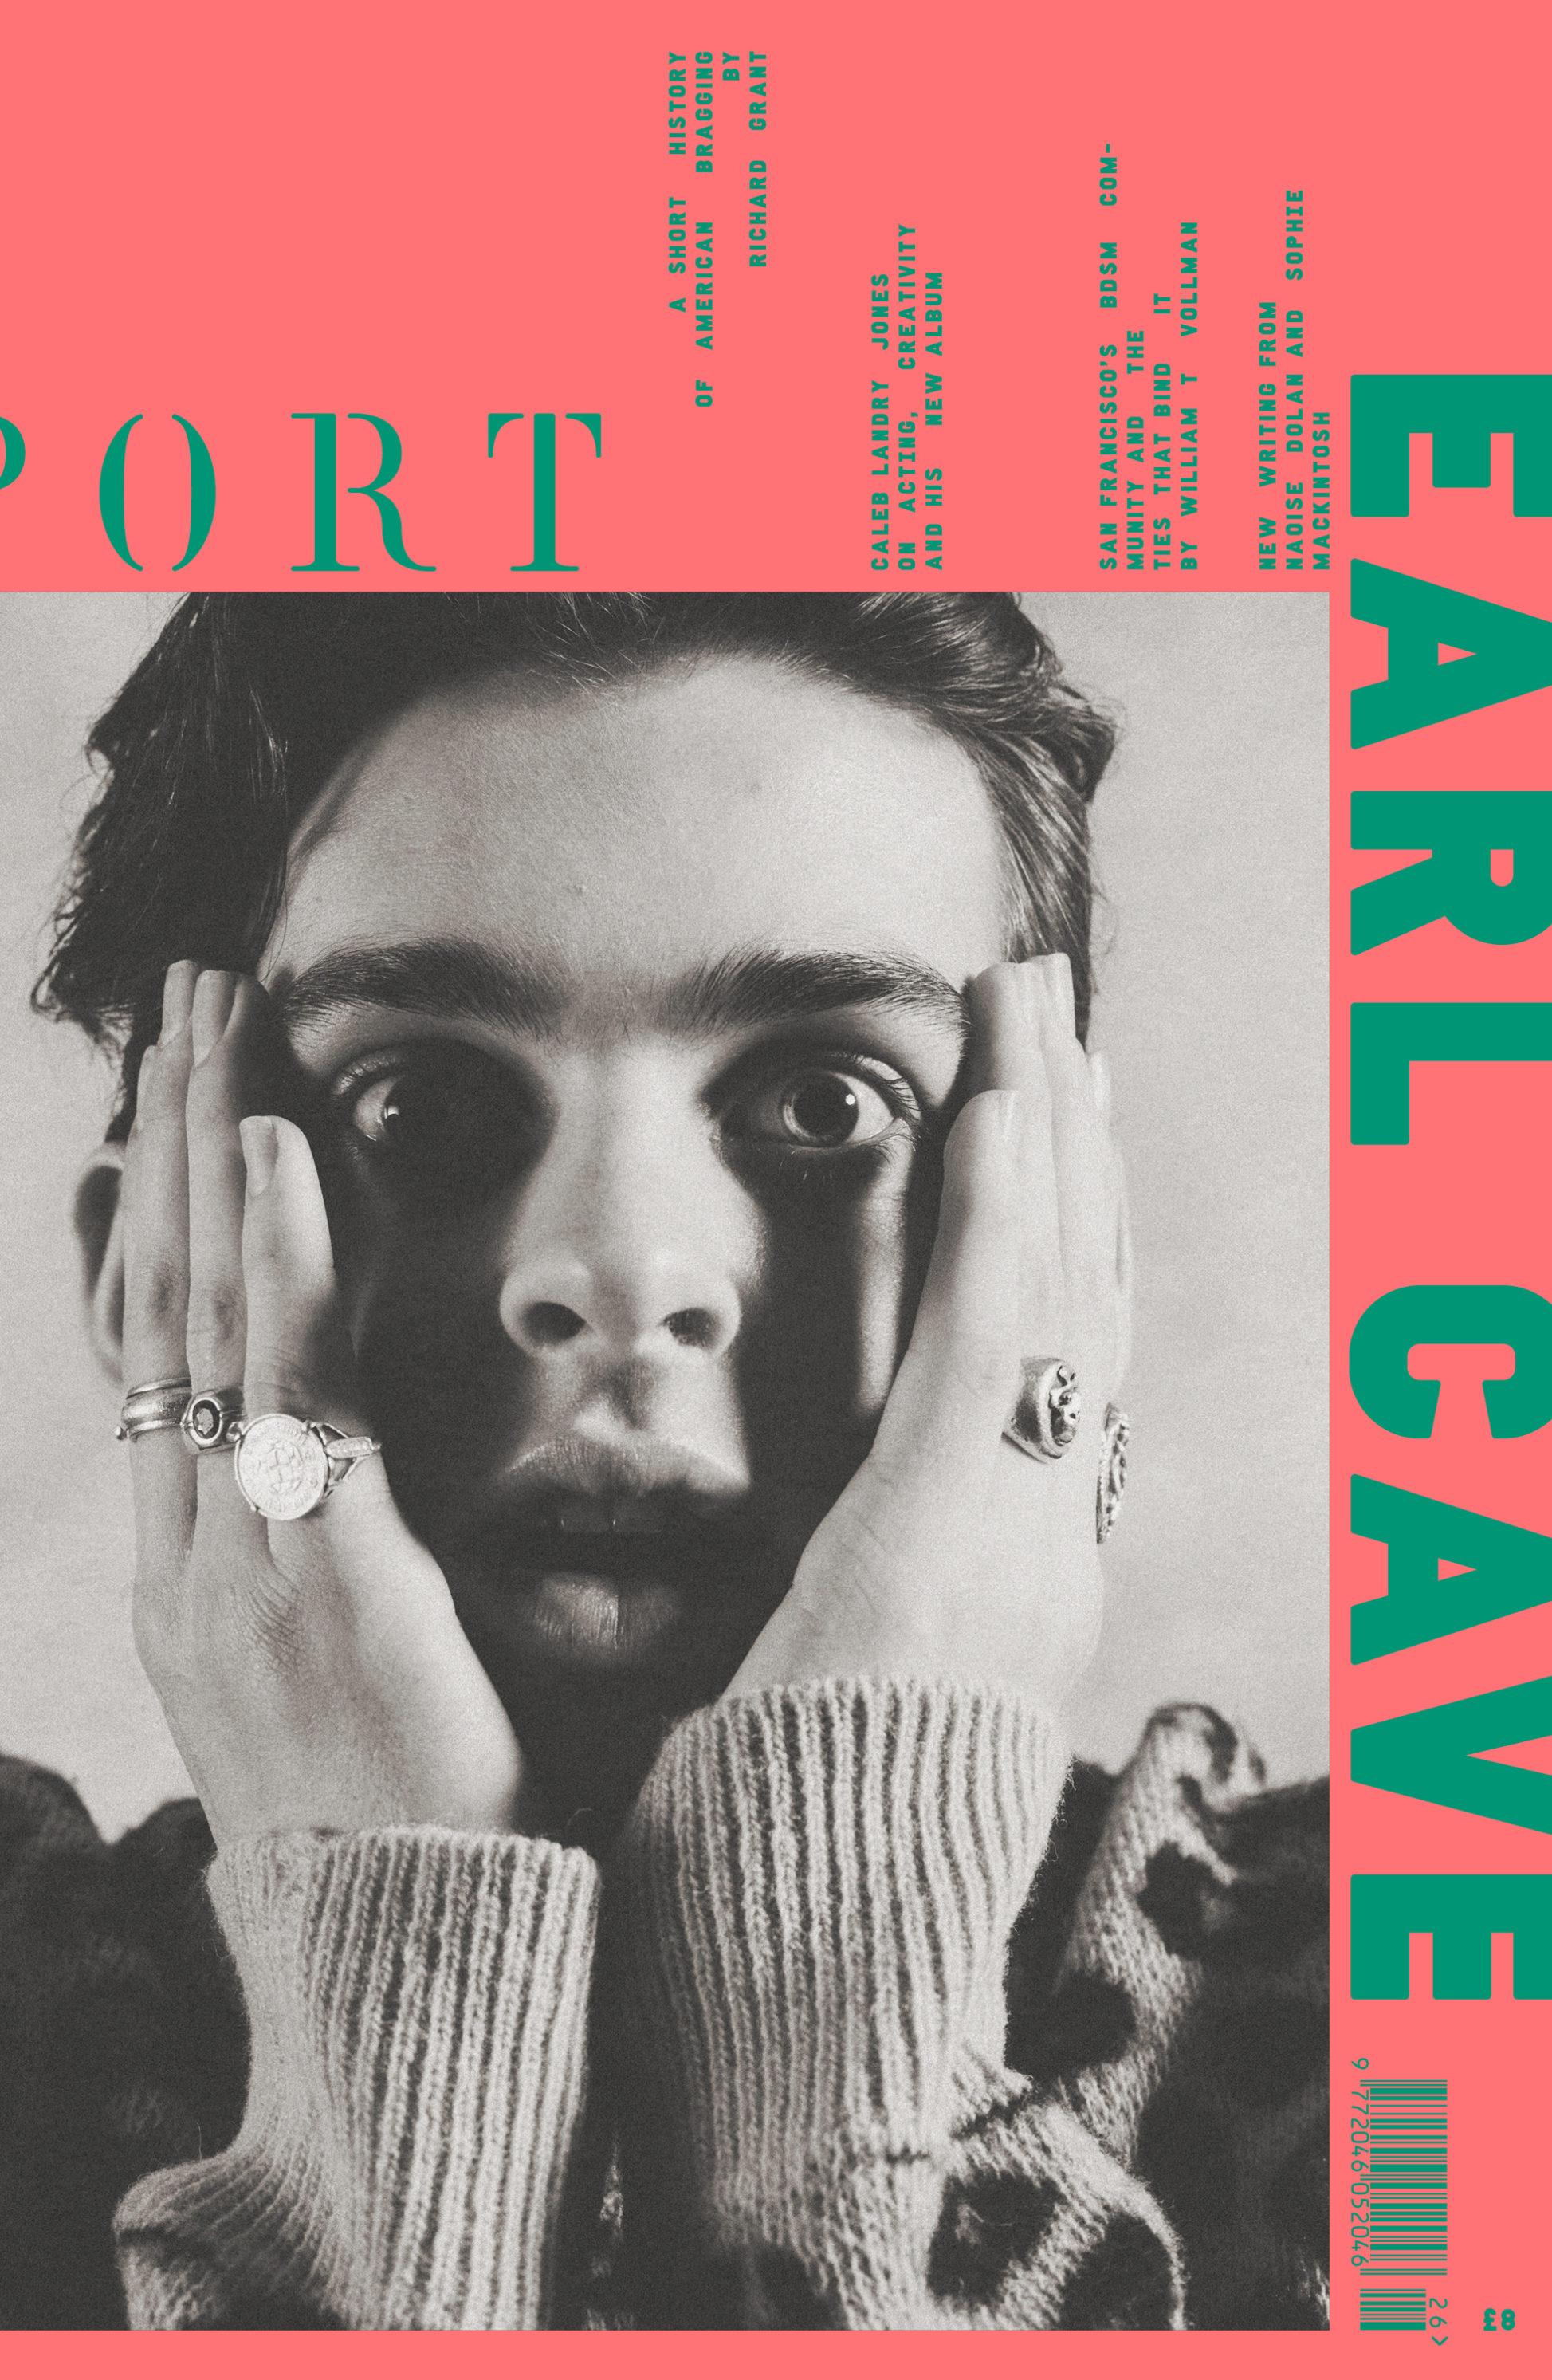 EARL CAVE | PORT MAGAZINE